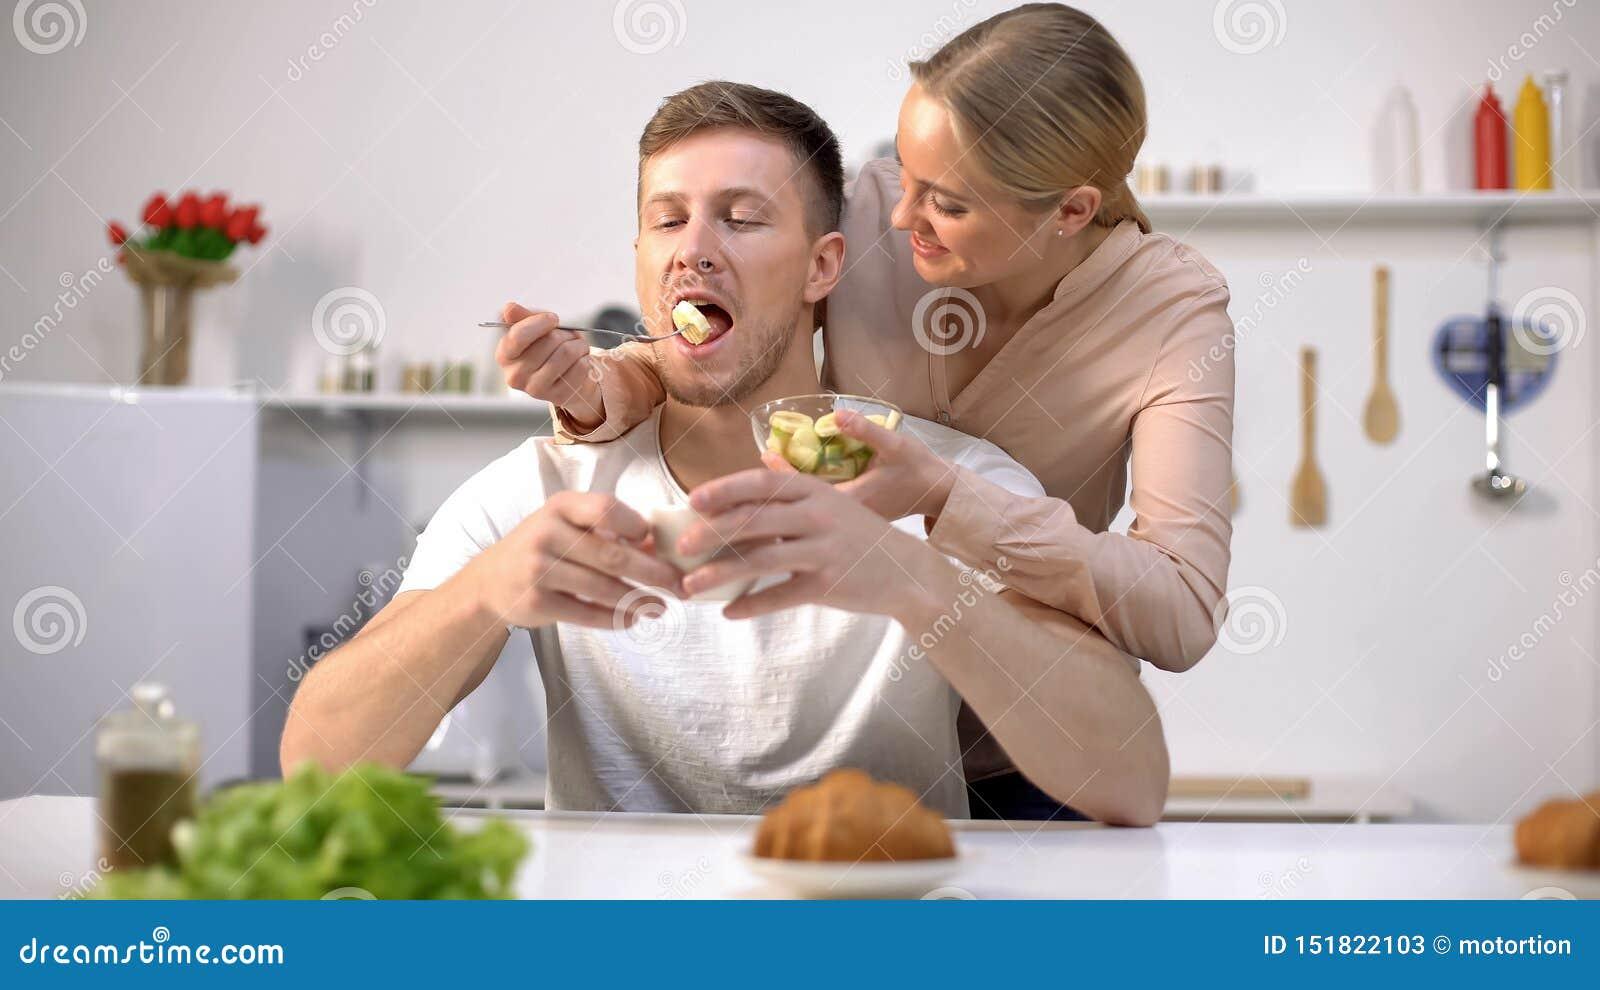 Lady playfully feeding husband with slice of banana, fruits as tasty vitamins